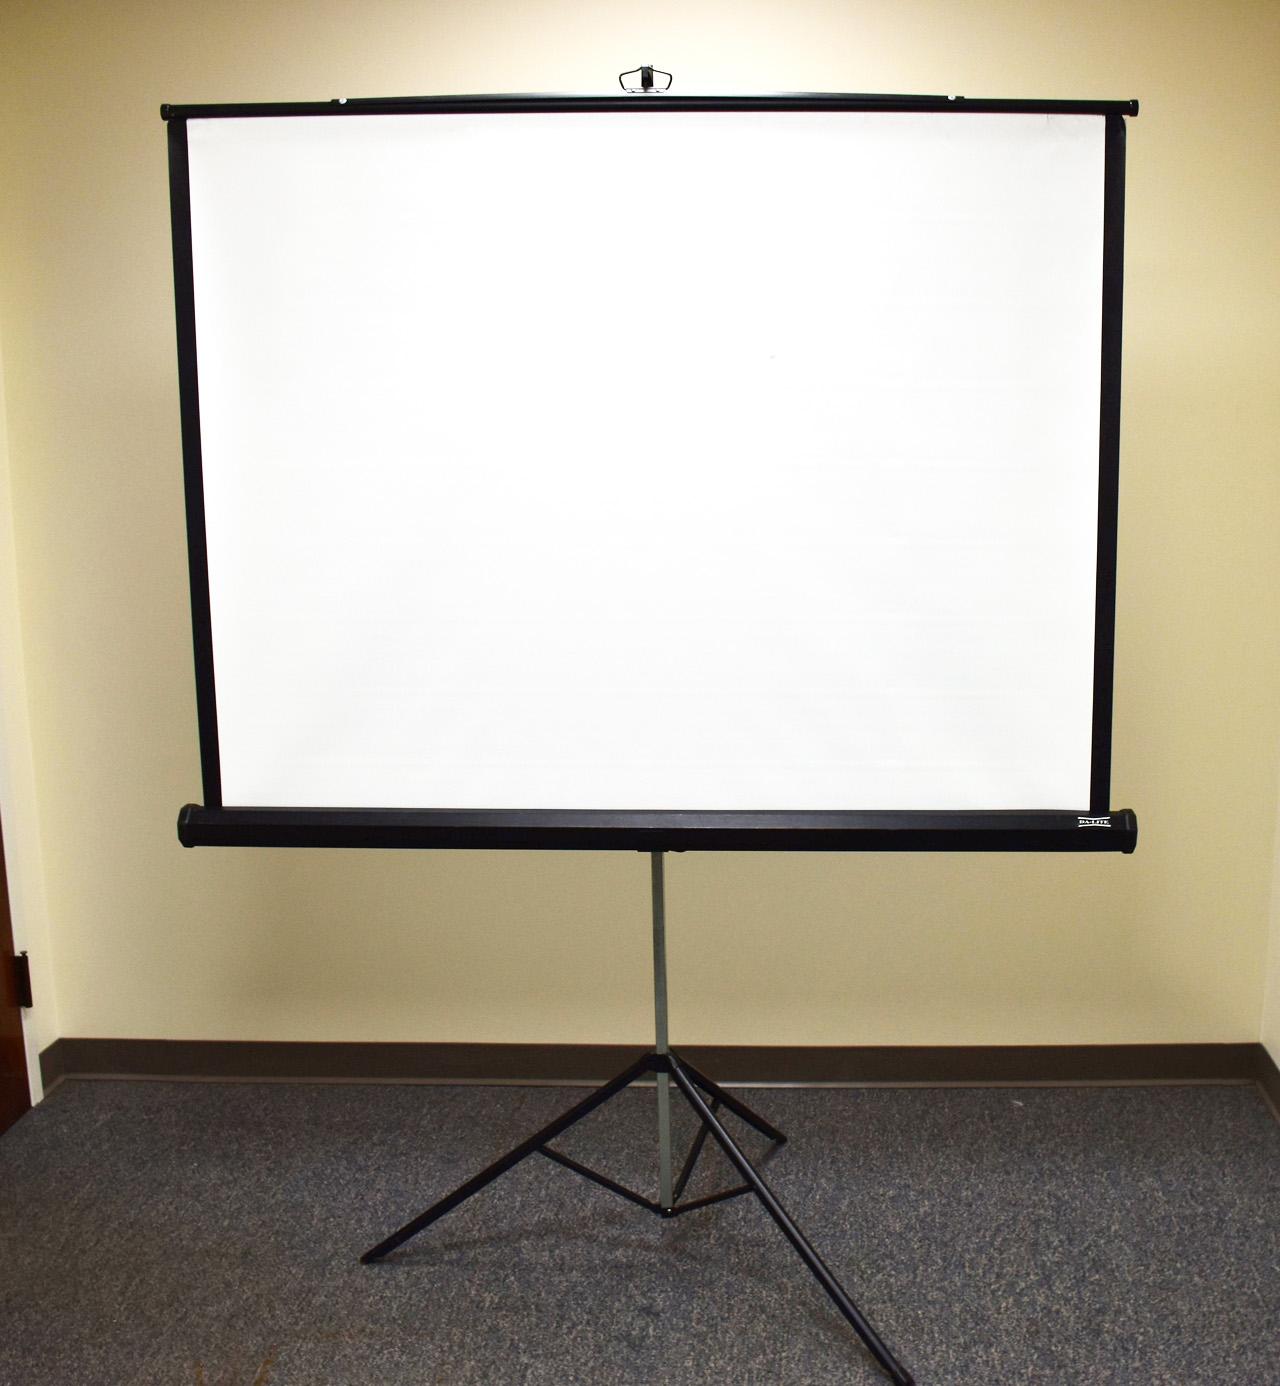 5-foot Screen